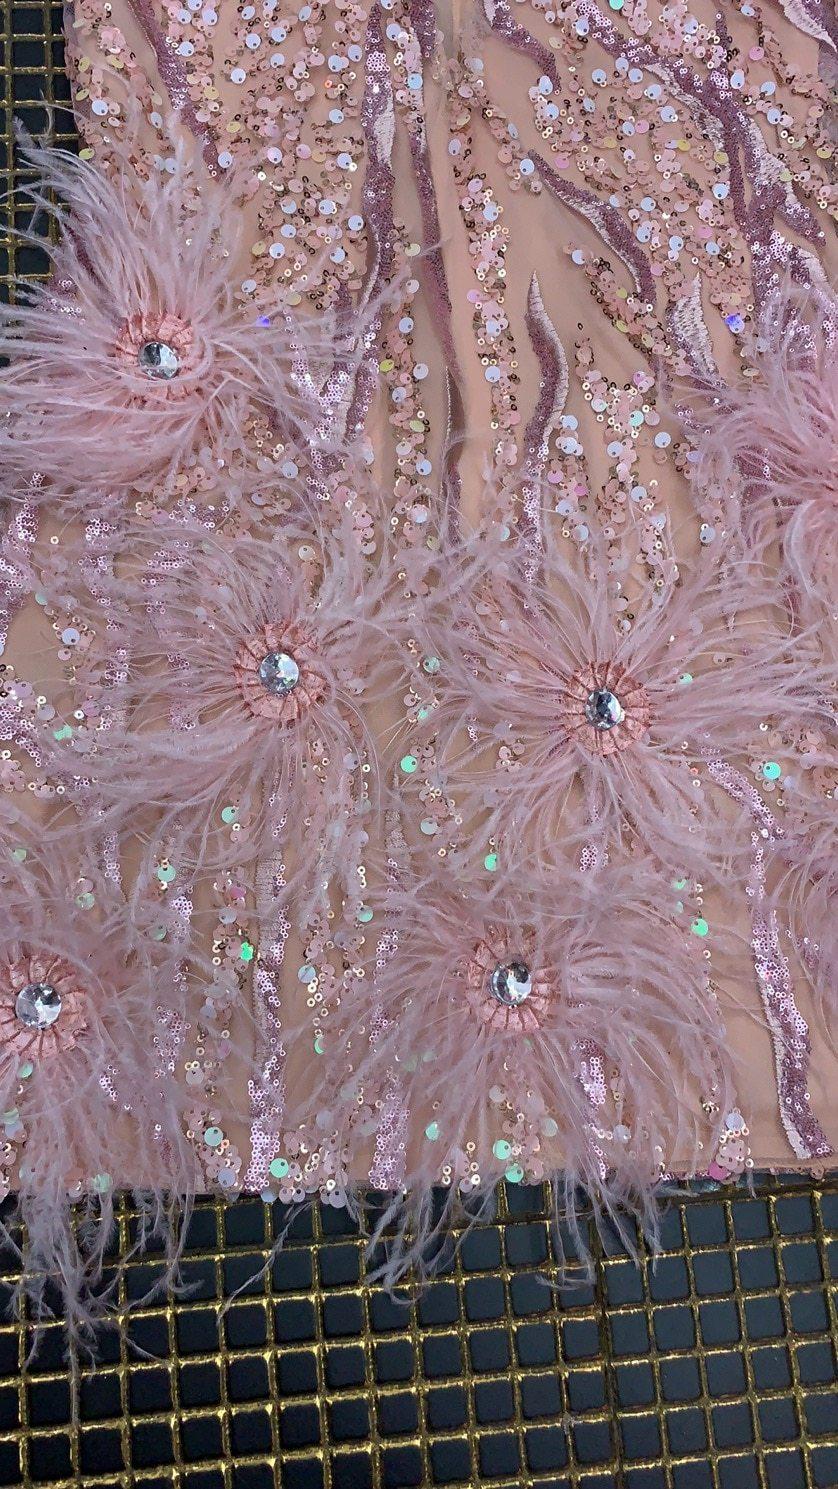 High Quality Pink Mini Feather V-neck Fashion Bodycon Dress Night Club Party Bodycon Dress